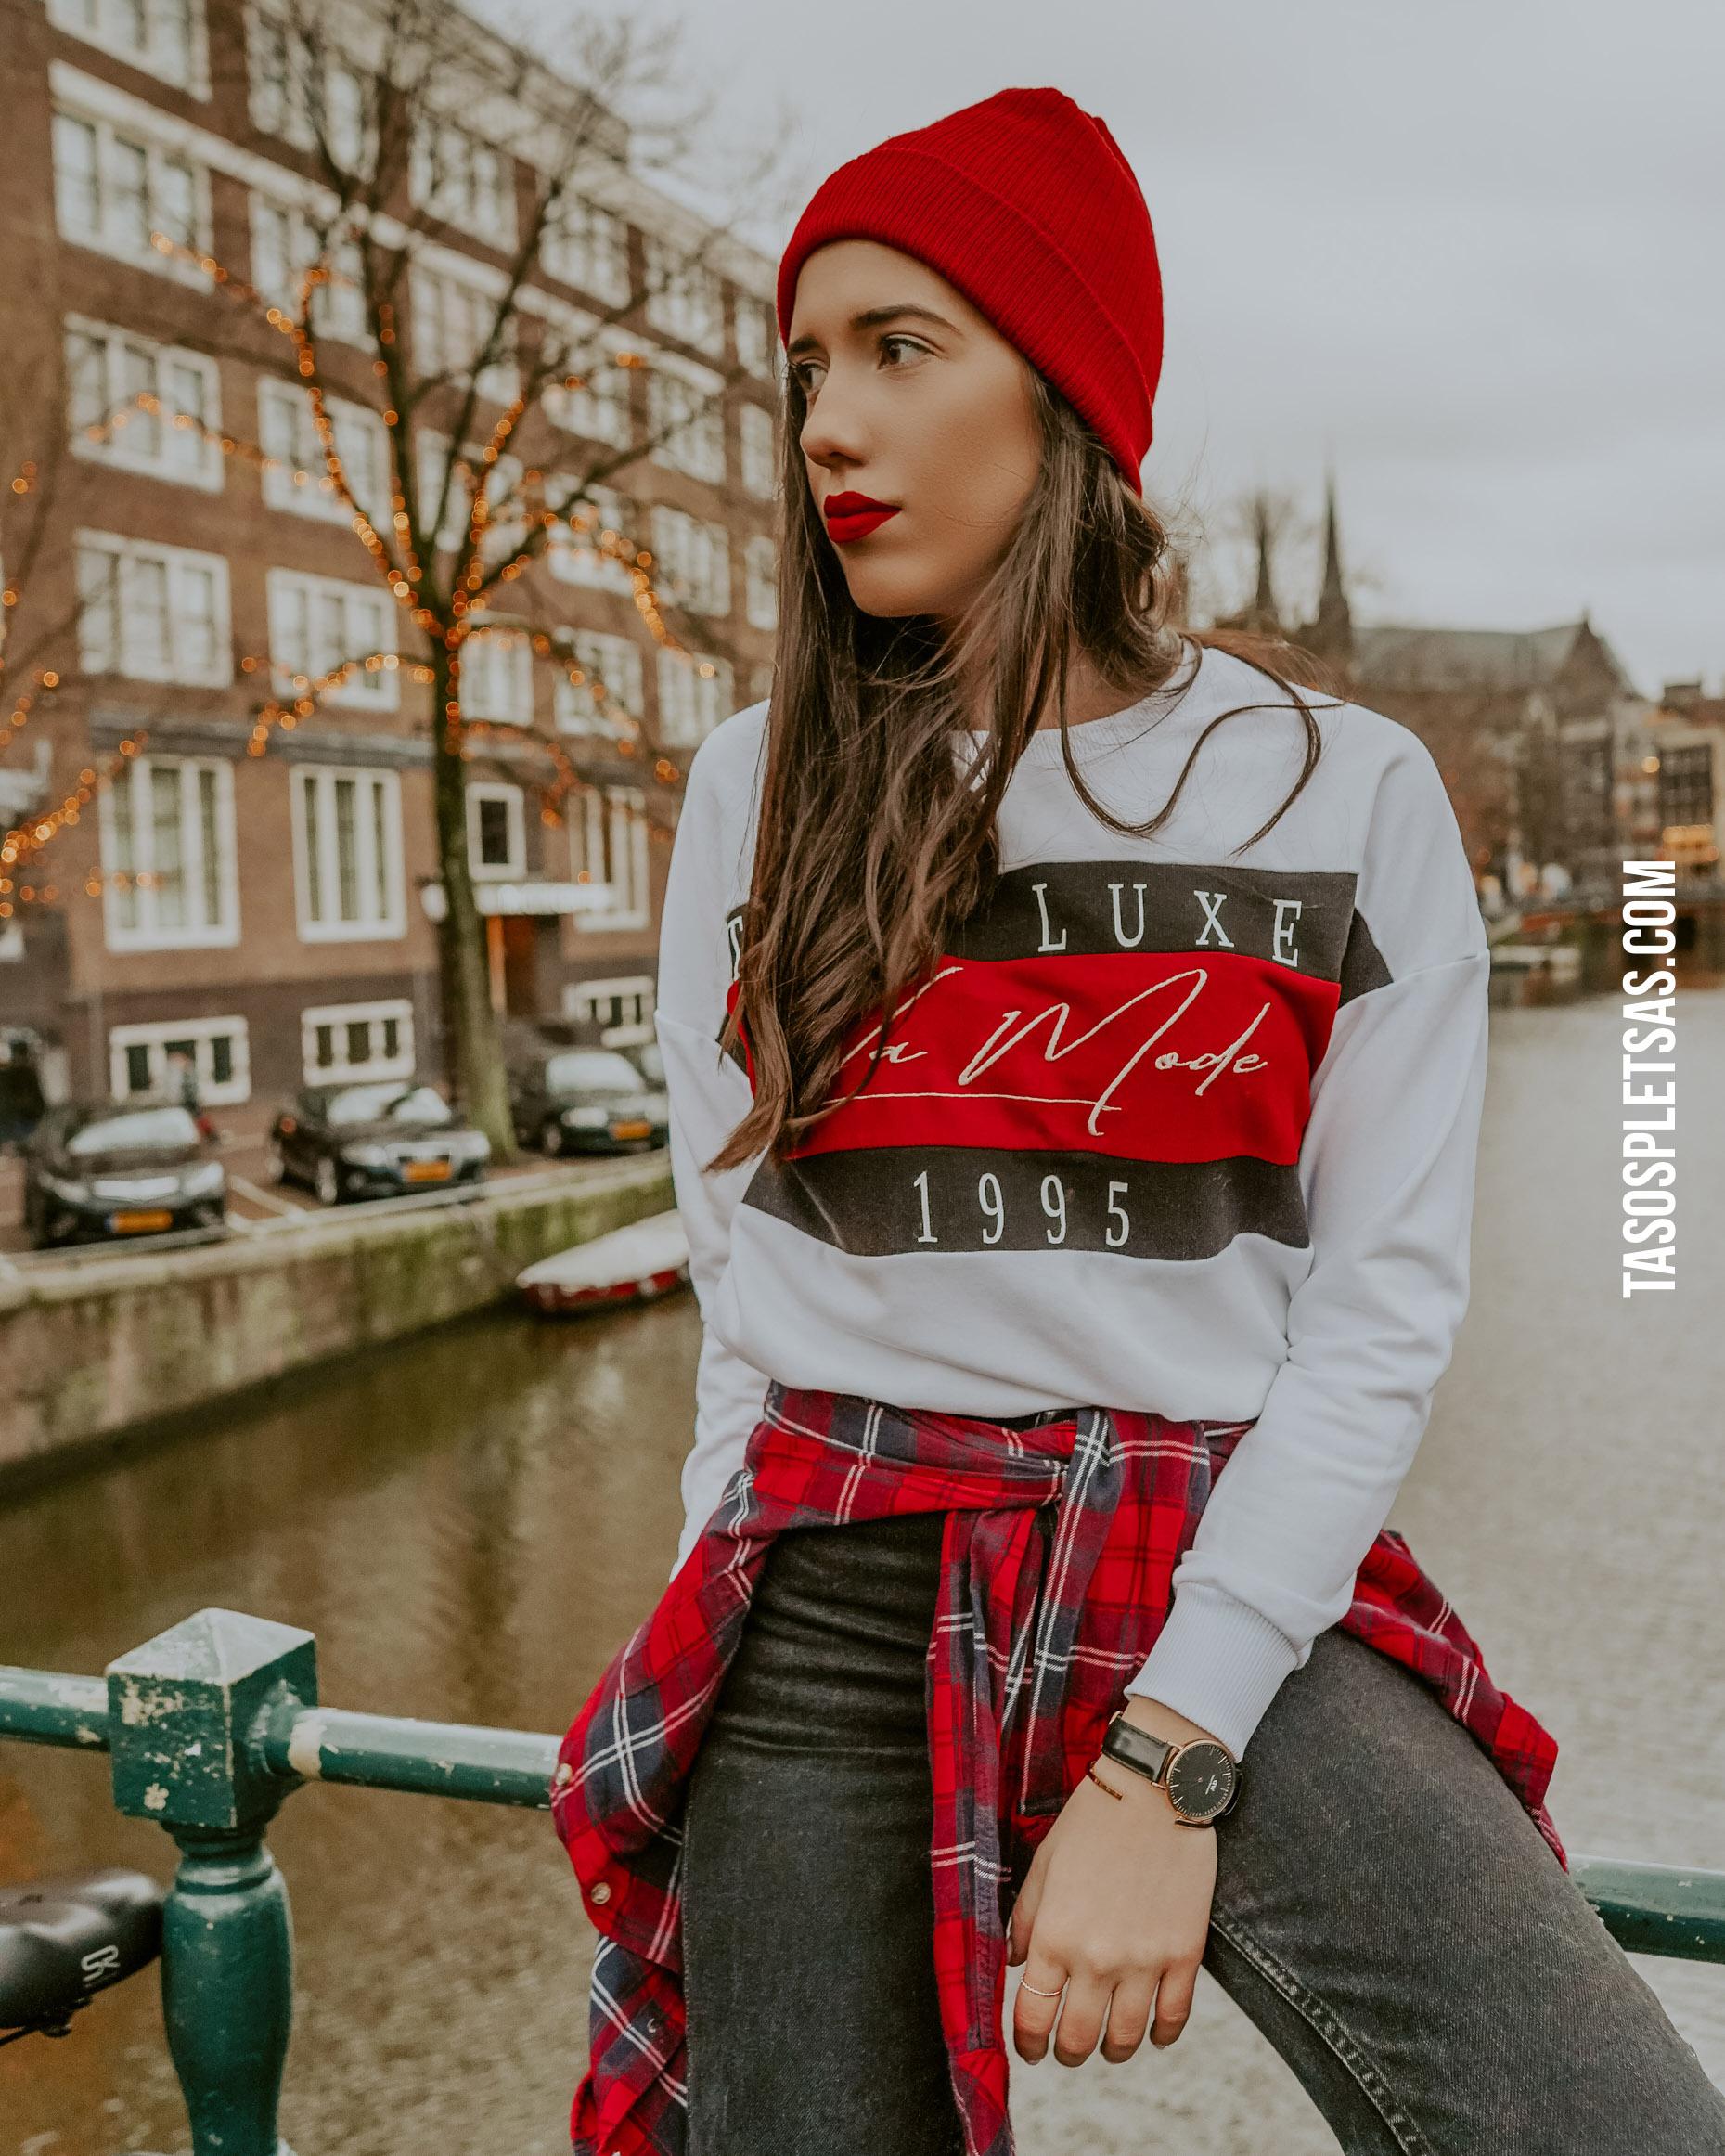 WEBSITE-Amsterdam-DSC00507 copy.jpg